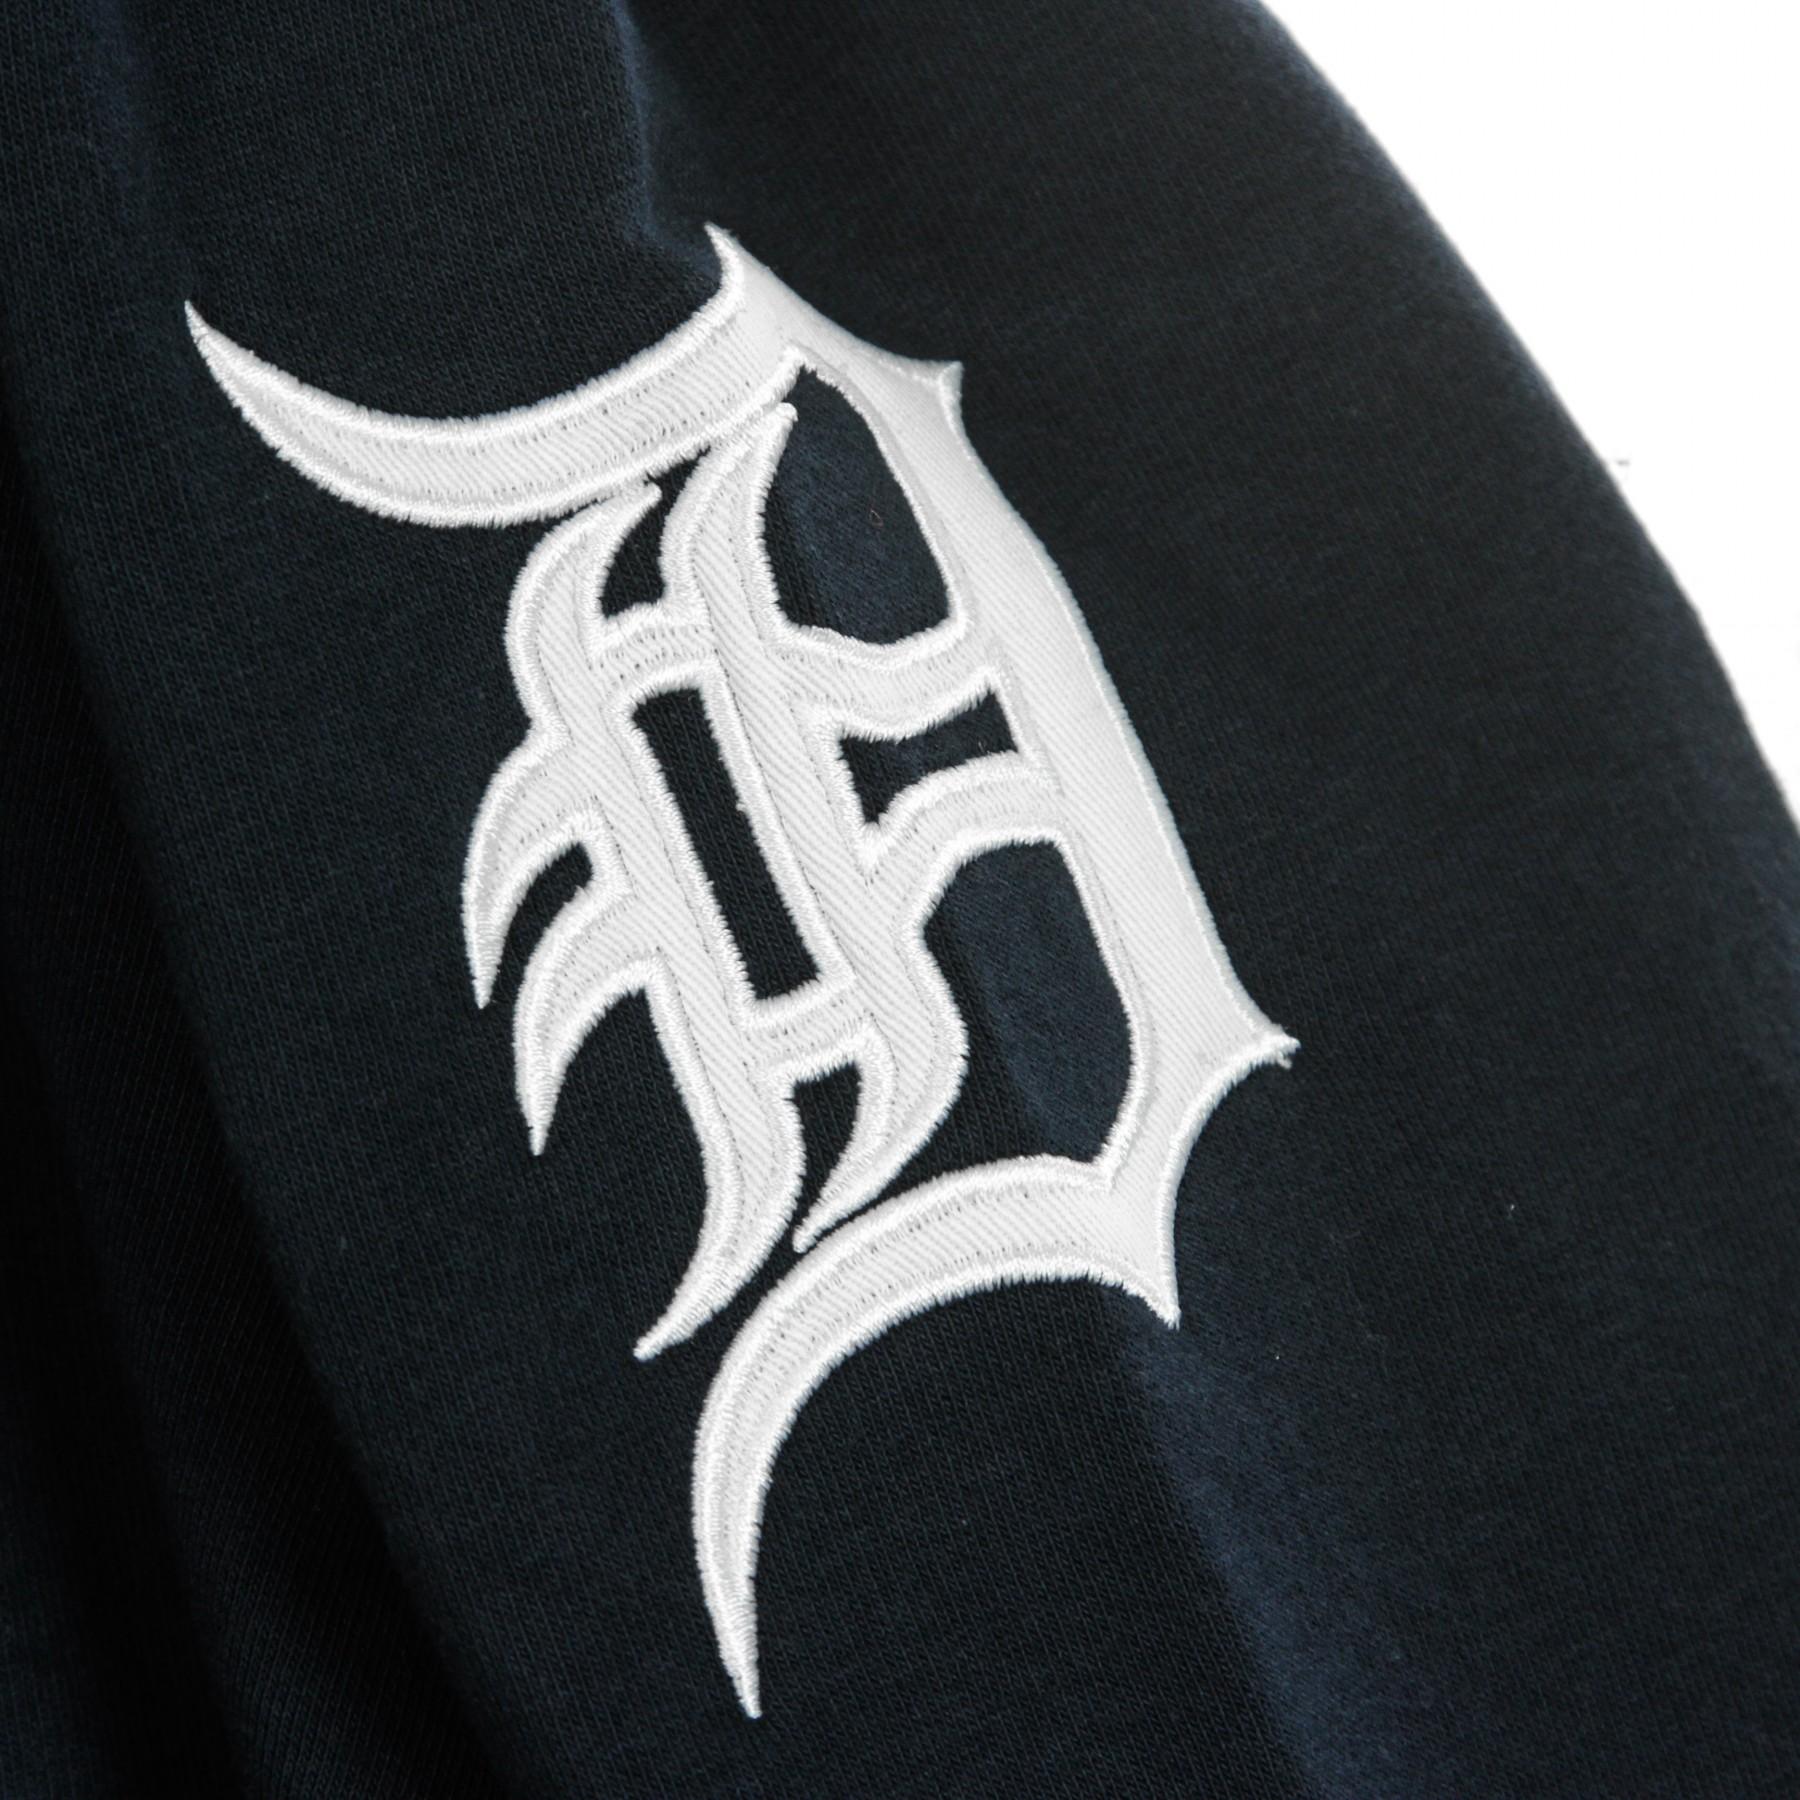 GIACCA TUTA MLB LEGENDARY TRACK JACKET DETTIG